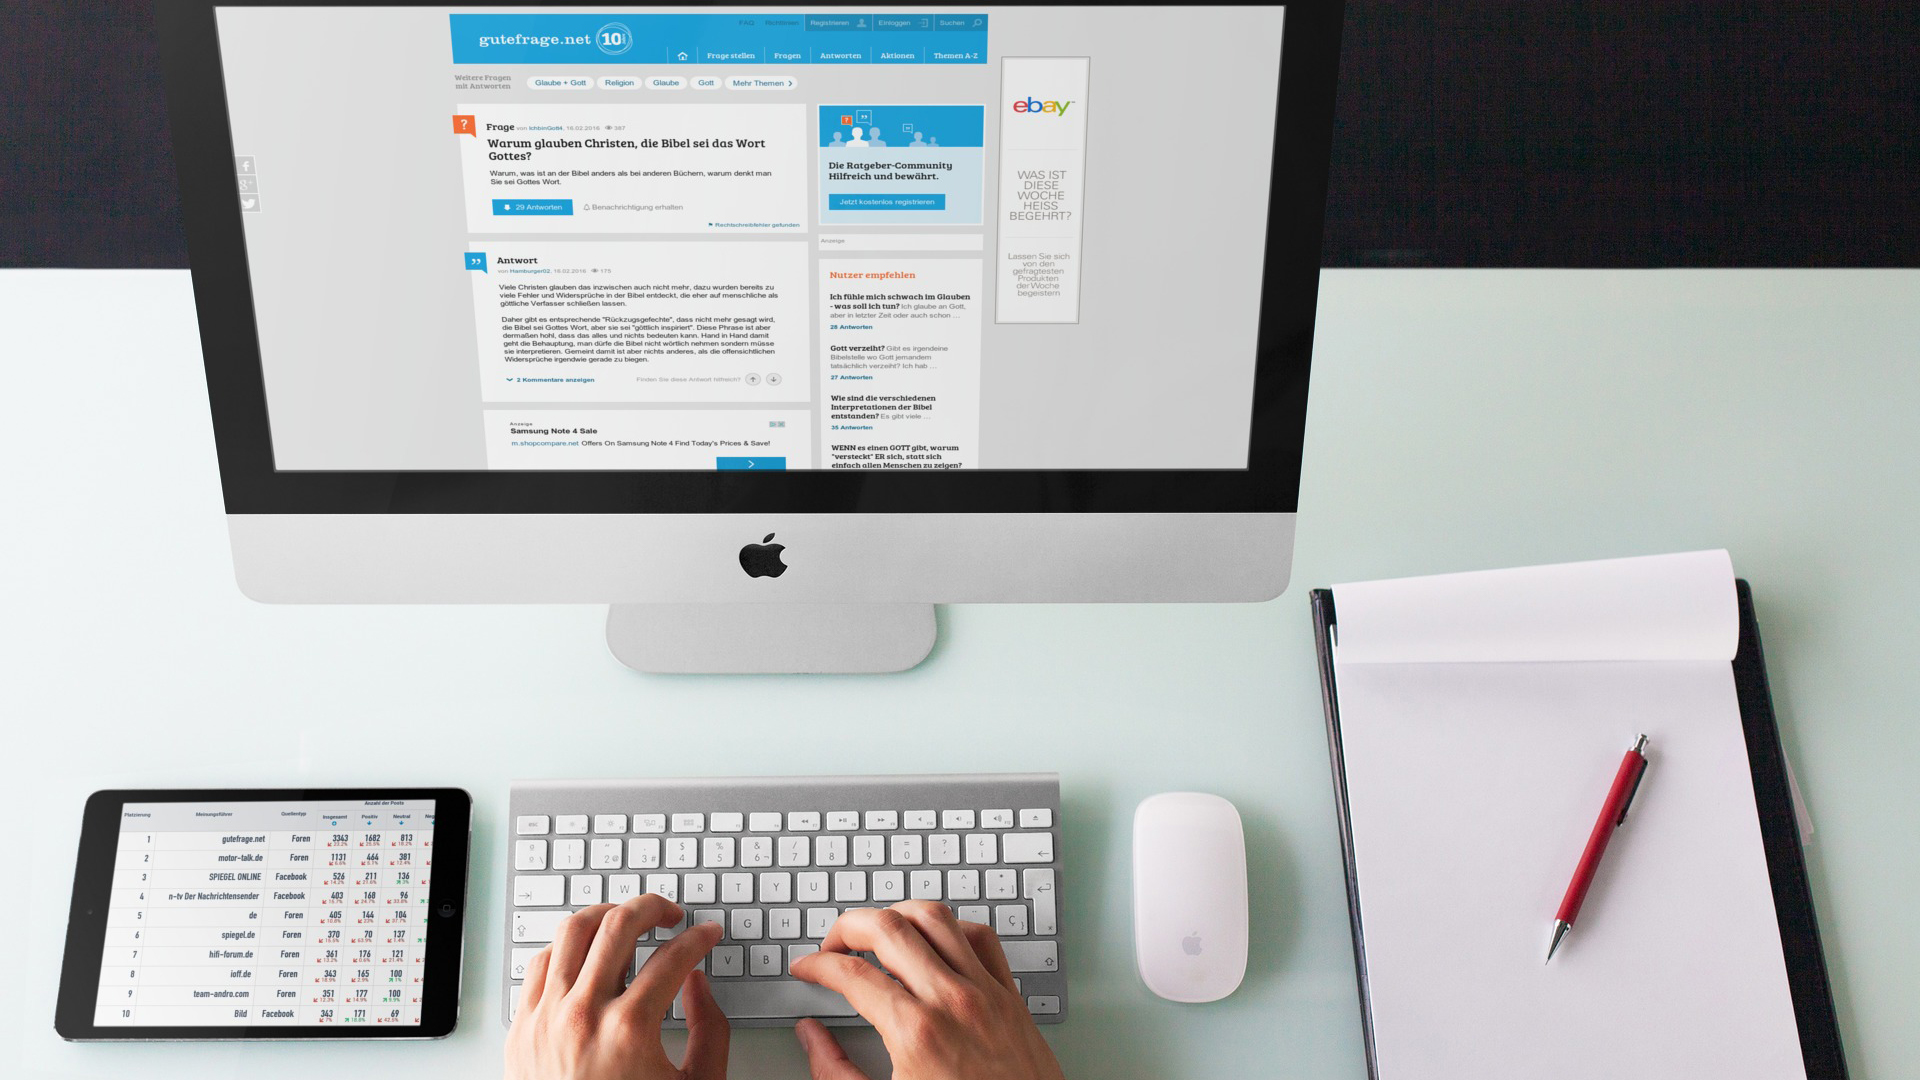 Internetseelsorge mit Echtzeit Social Media Monitoring